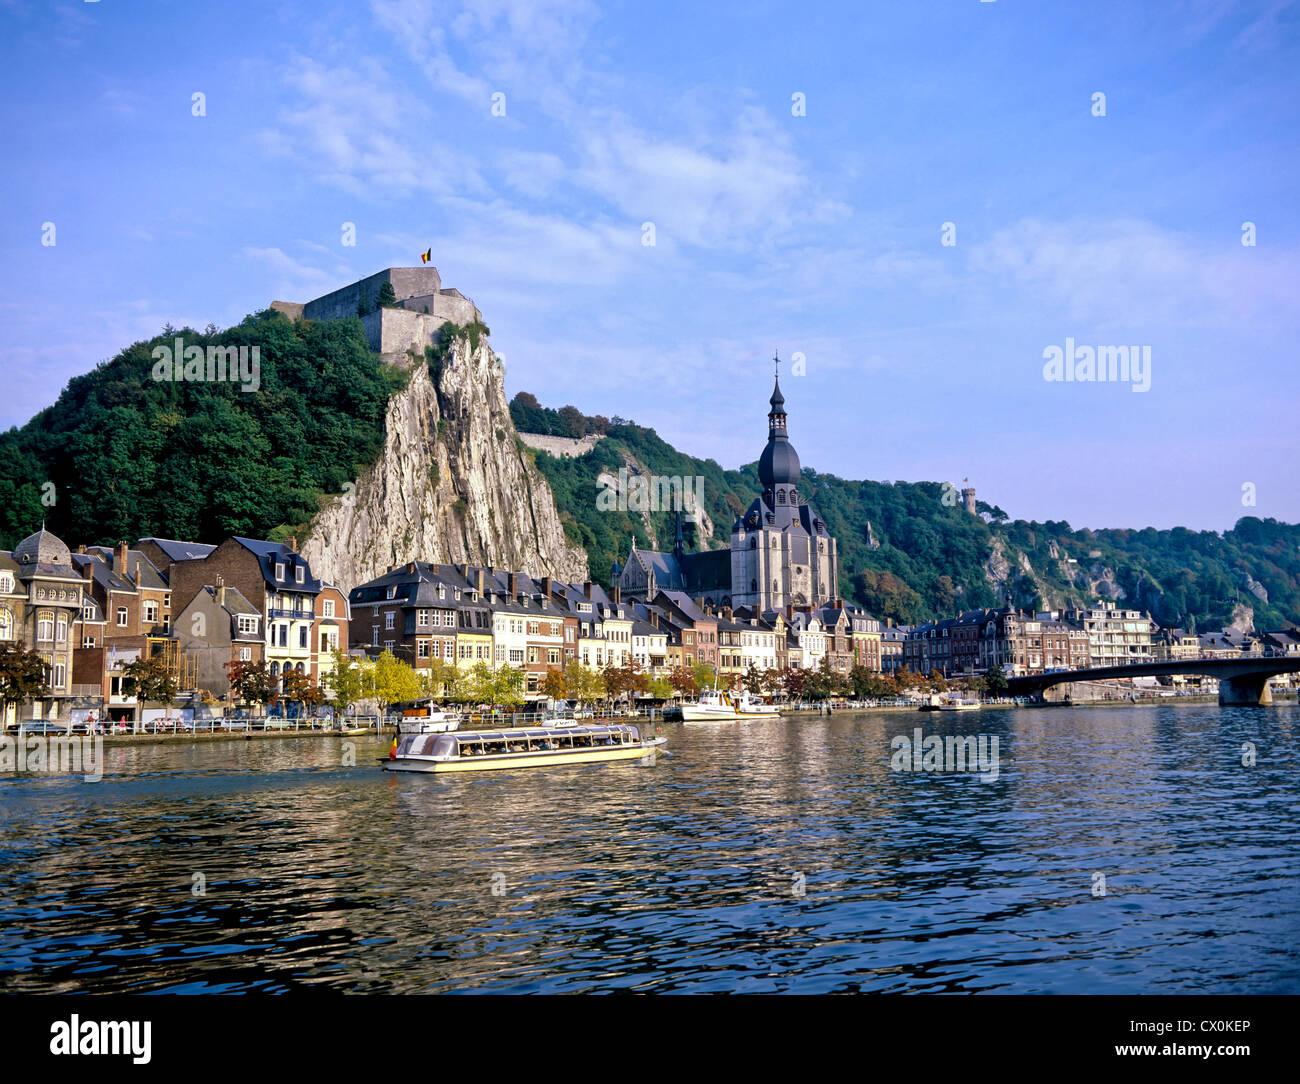 8160. Dinant & R Meuse, Ardennes, Belgium, Europe - Stock Image